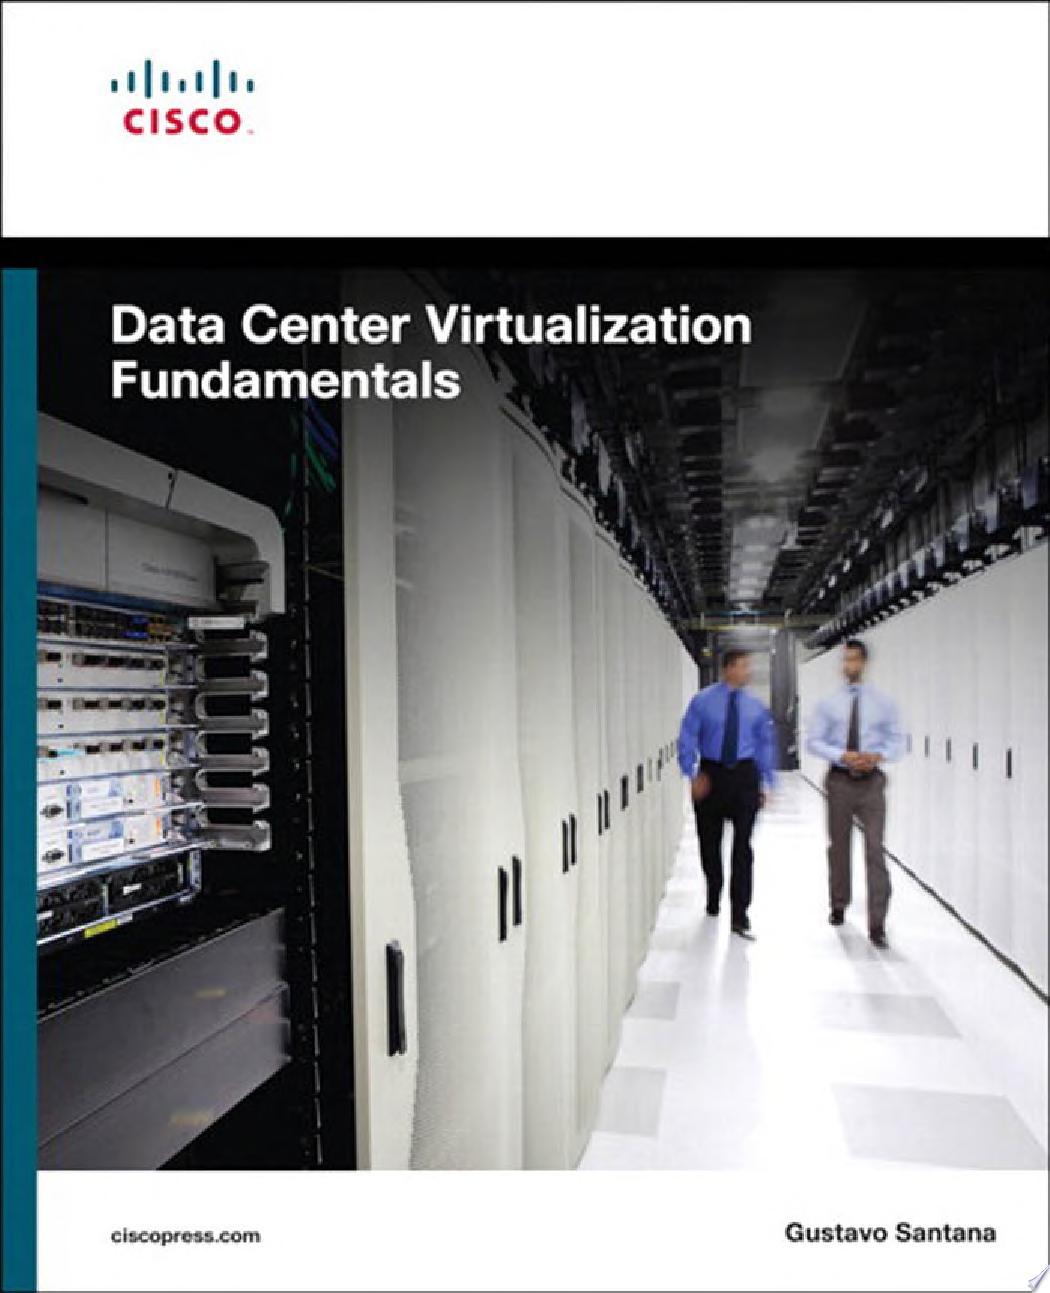 Data Center Virtualization Fundamentals